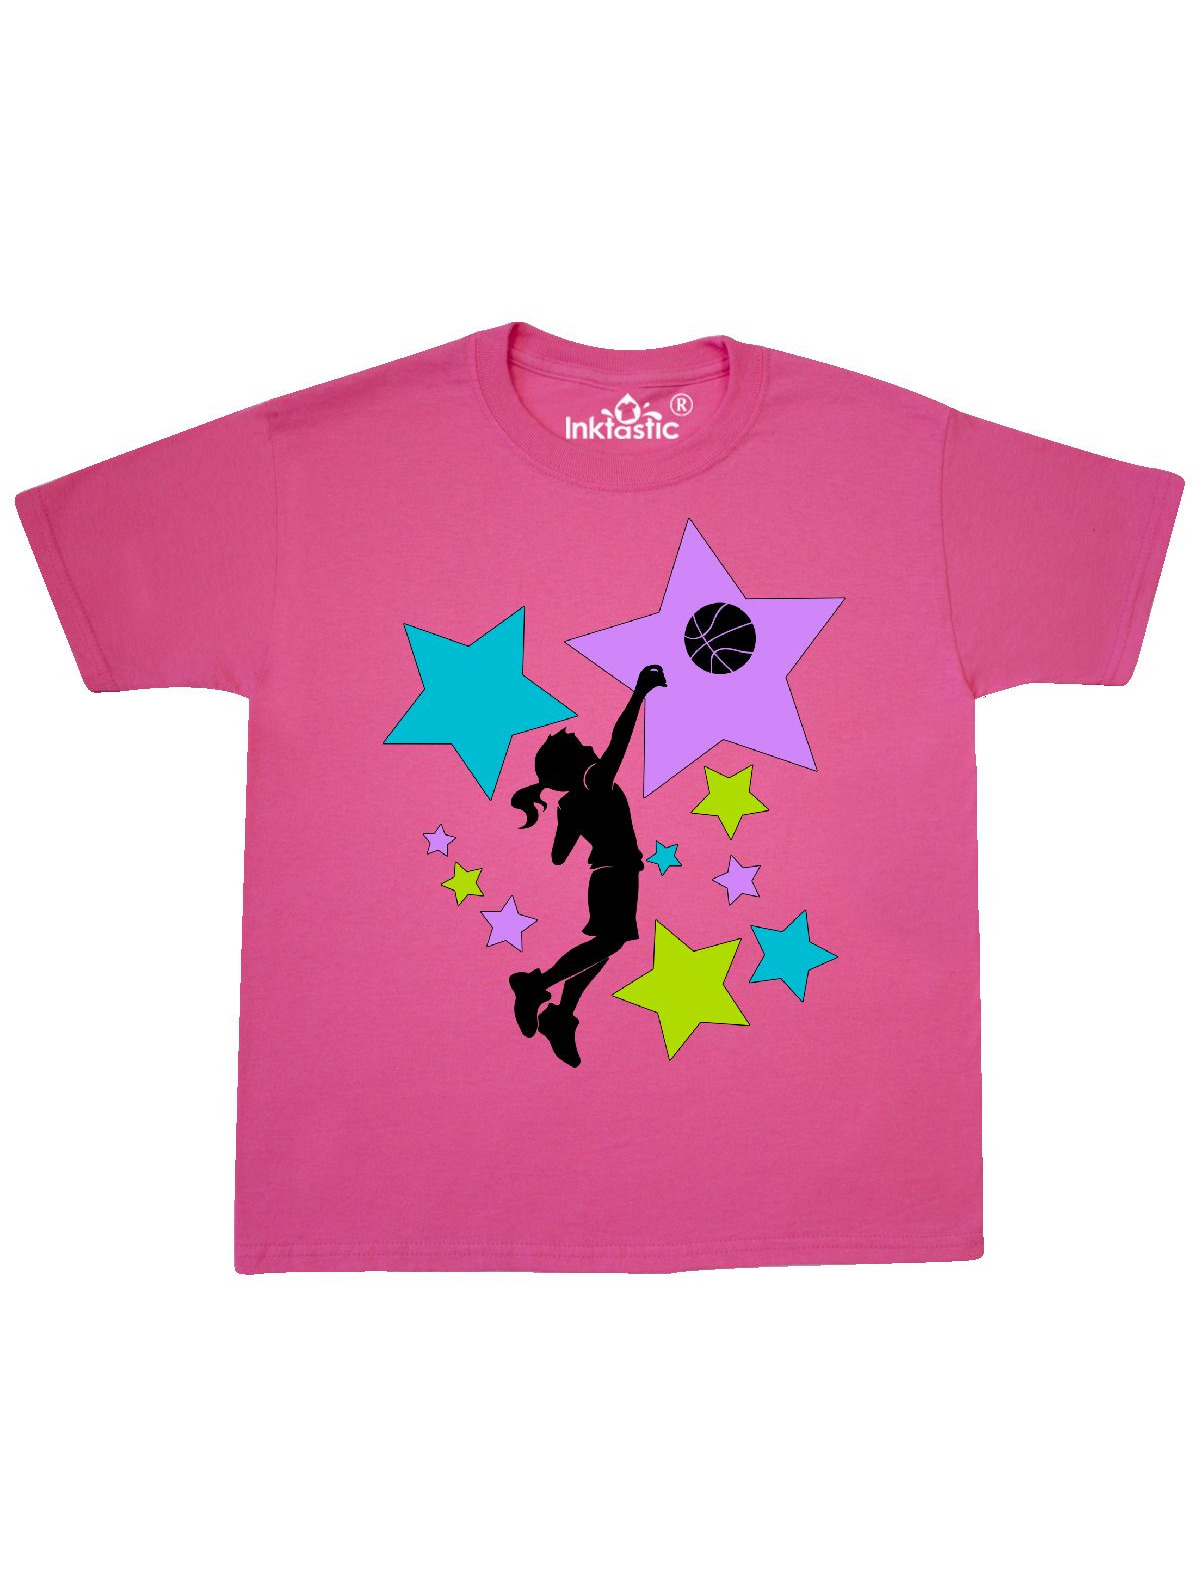 Girl Playing Basketball purple, blue, green stars Youth T-Shirt